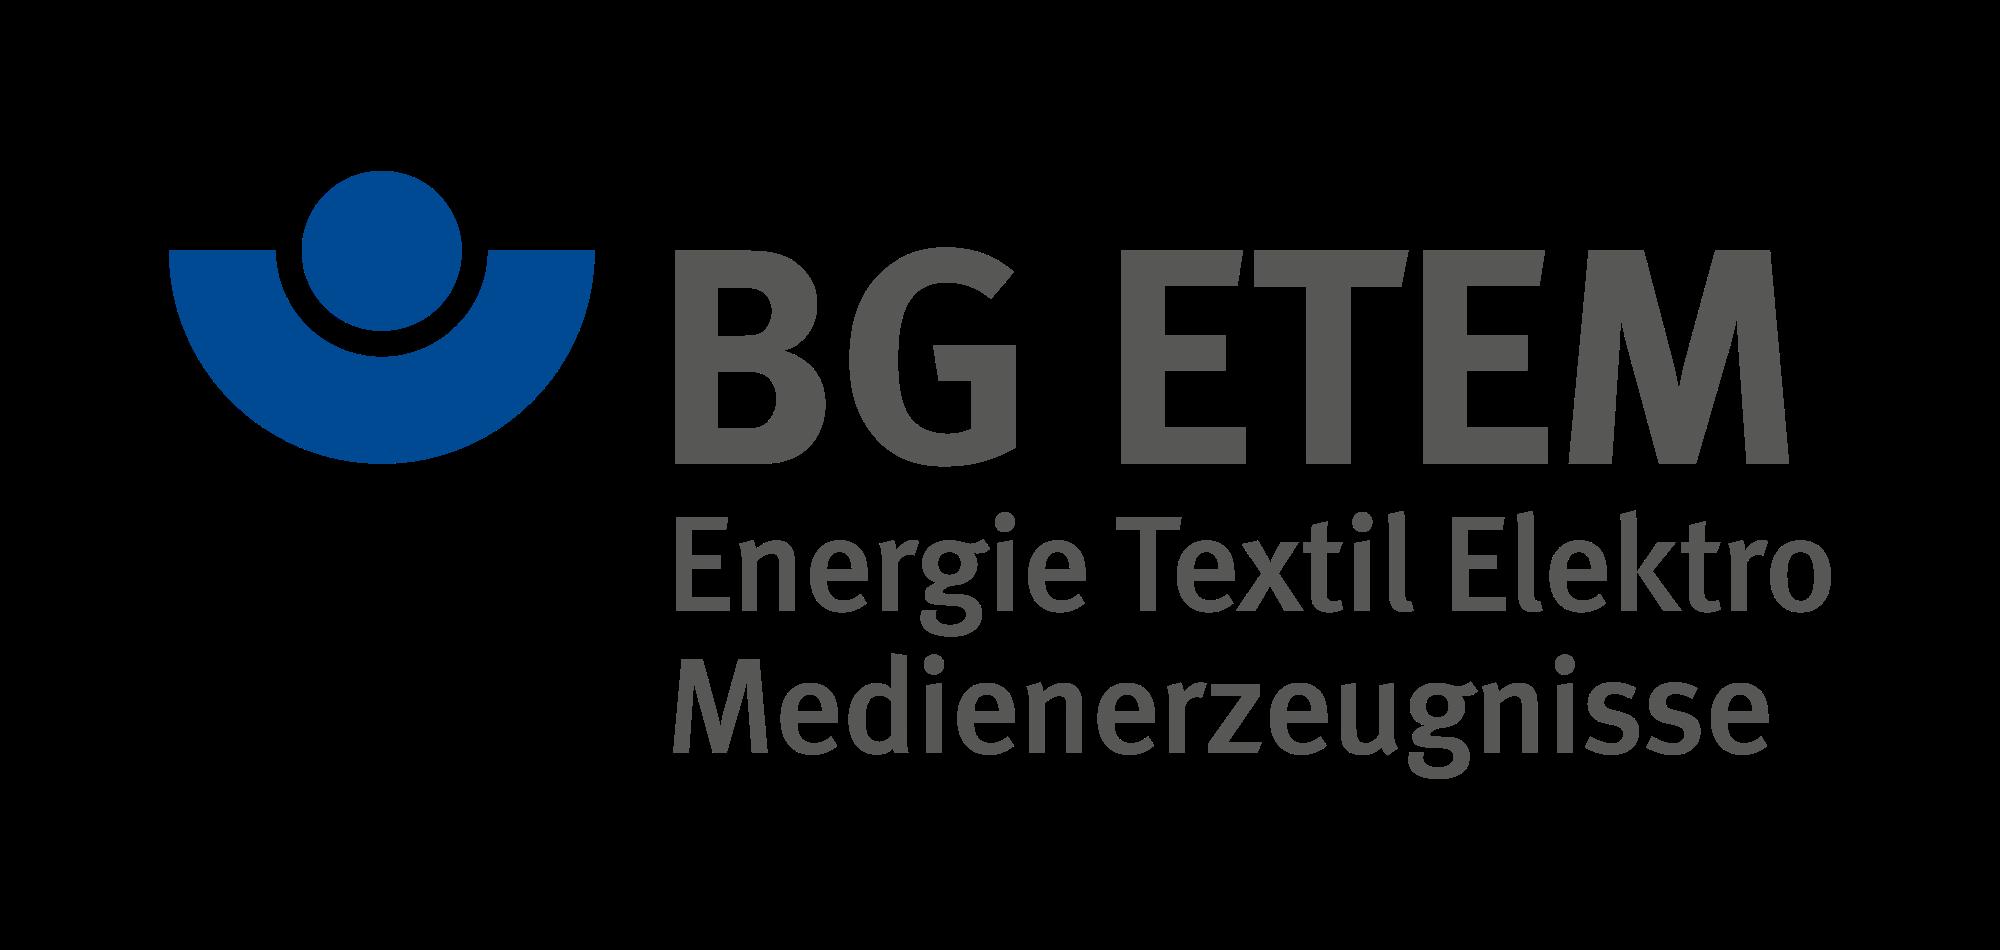 BGETEM_Logo_2010_svg